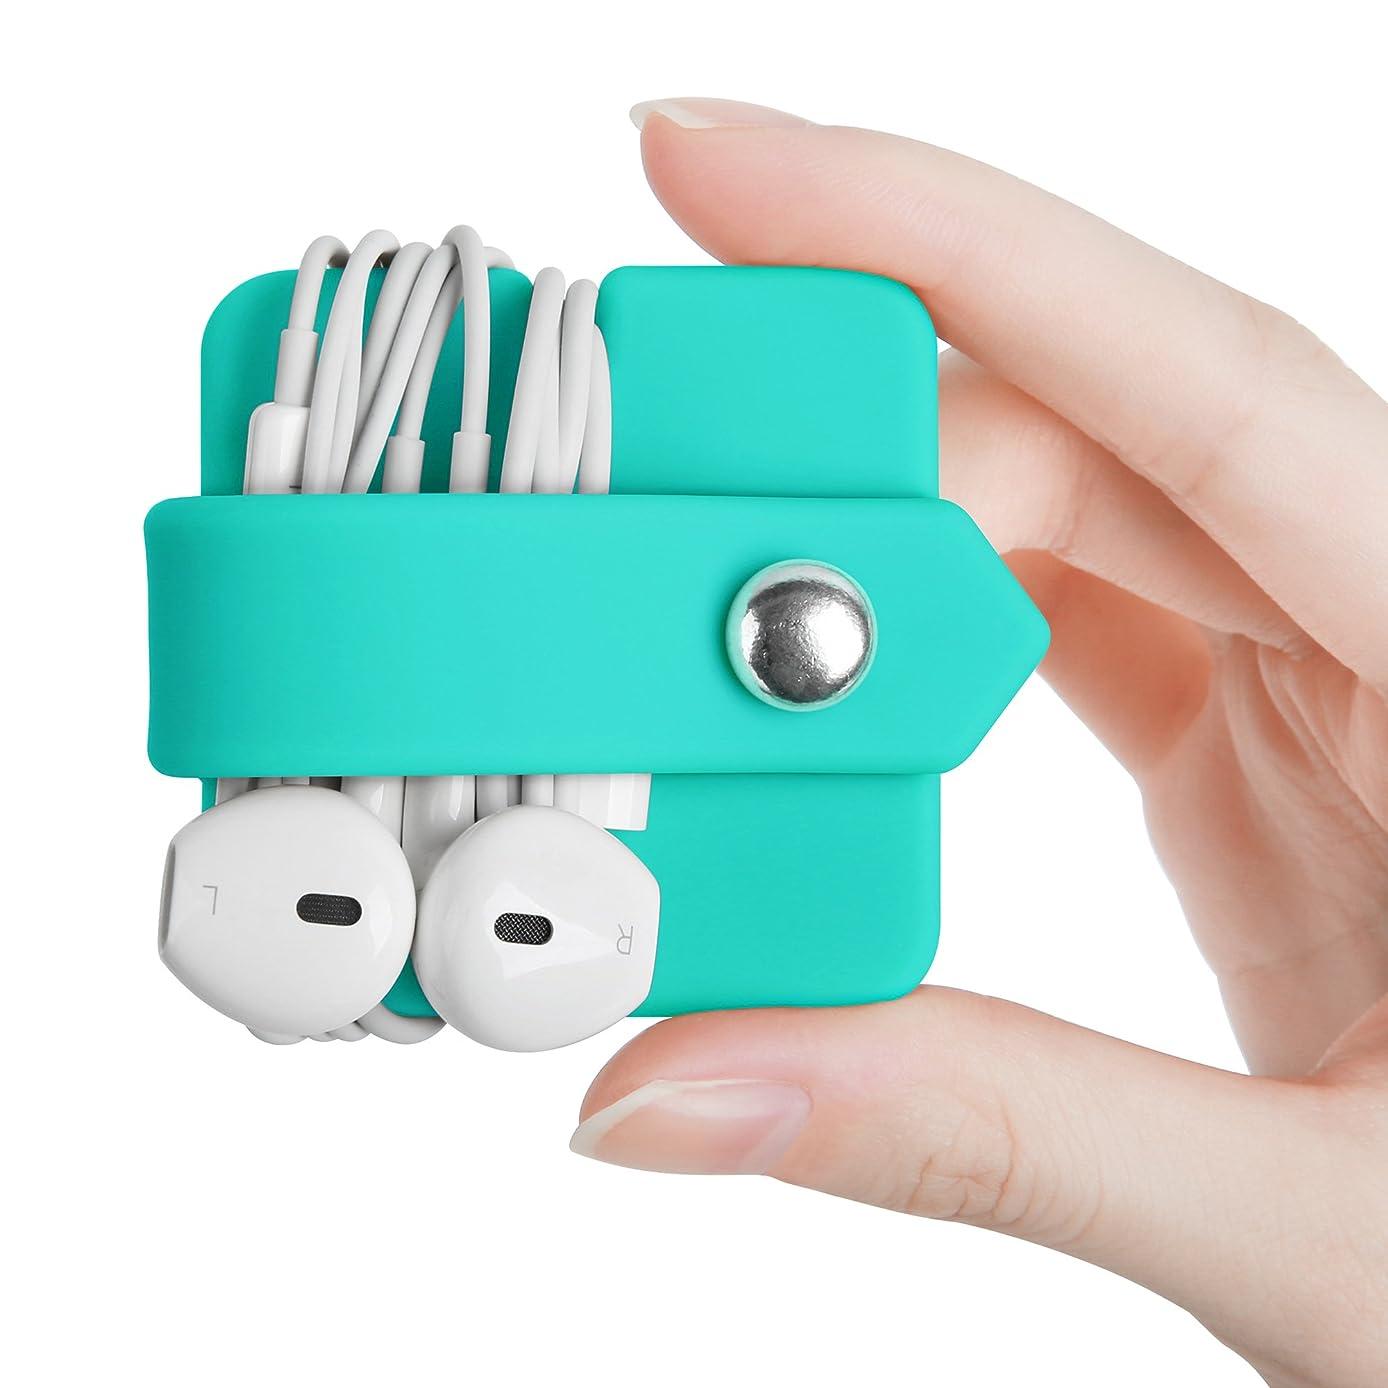 ELFRhino Silicone Earphone Organizer Earphone Wrap Winder Headphone Cord Organizer Wrap Winder Manager/Cable Winder(Blue, 1 Piece)